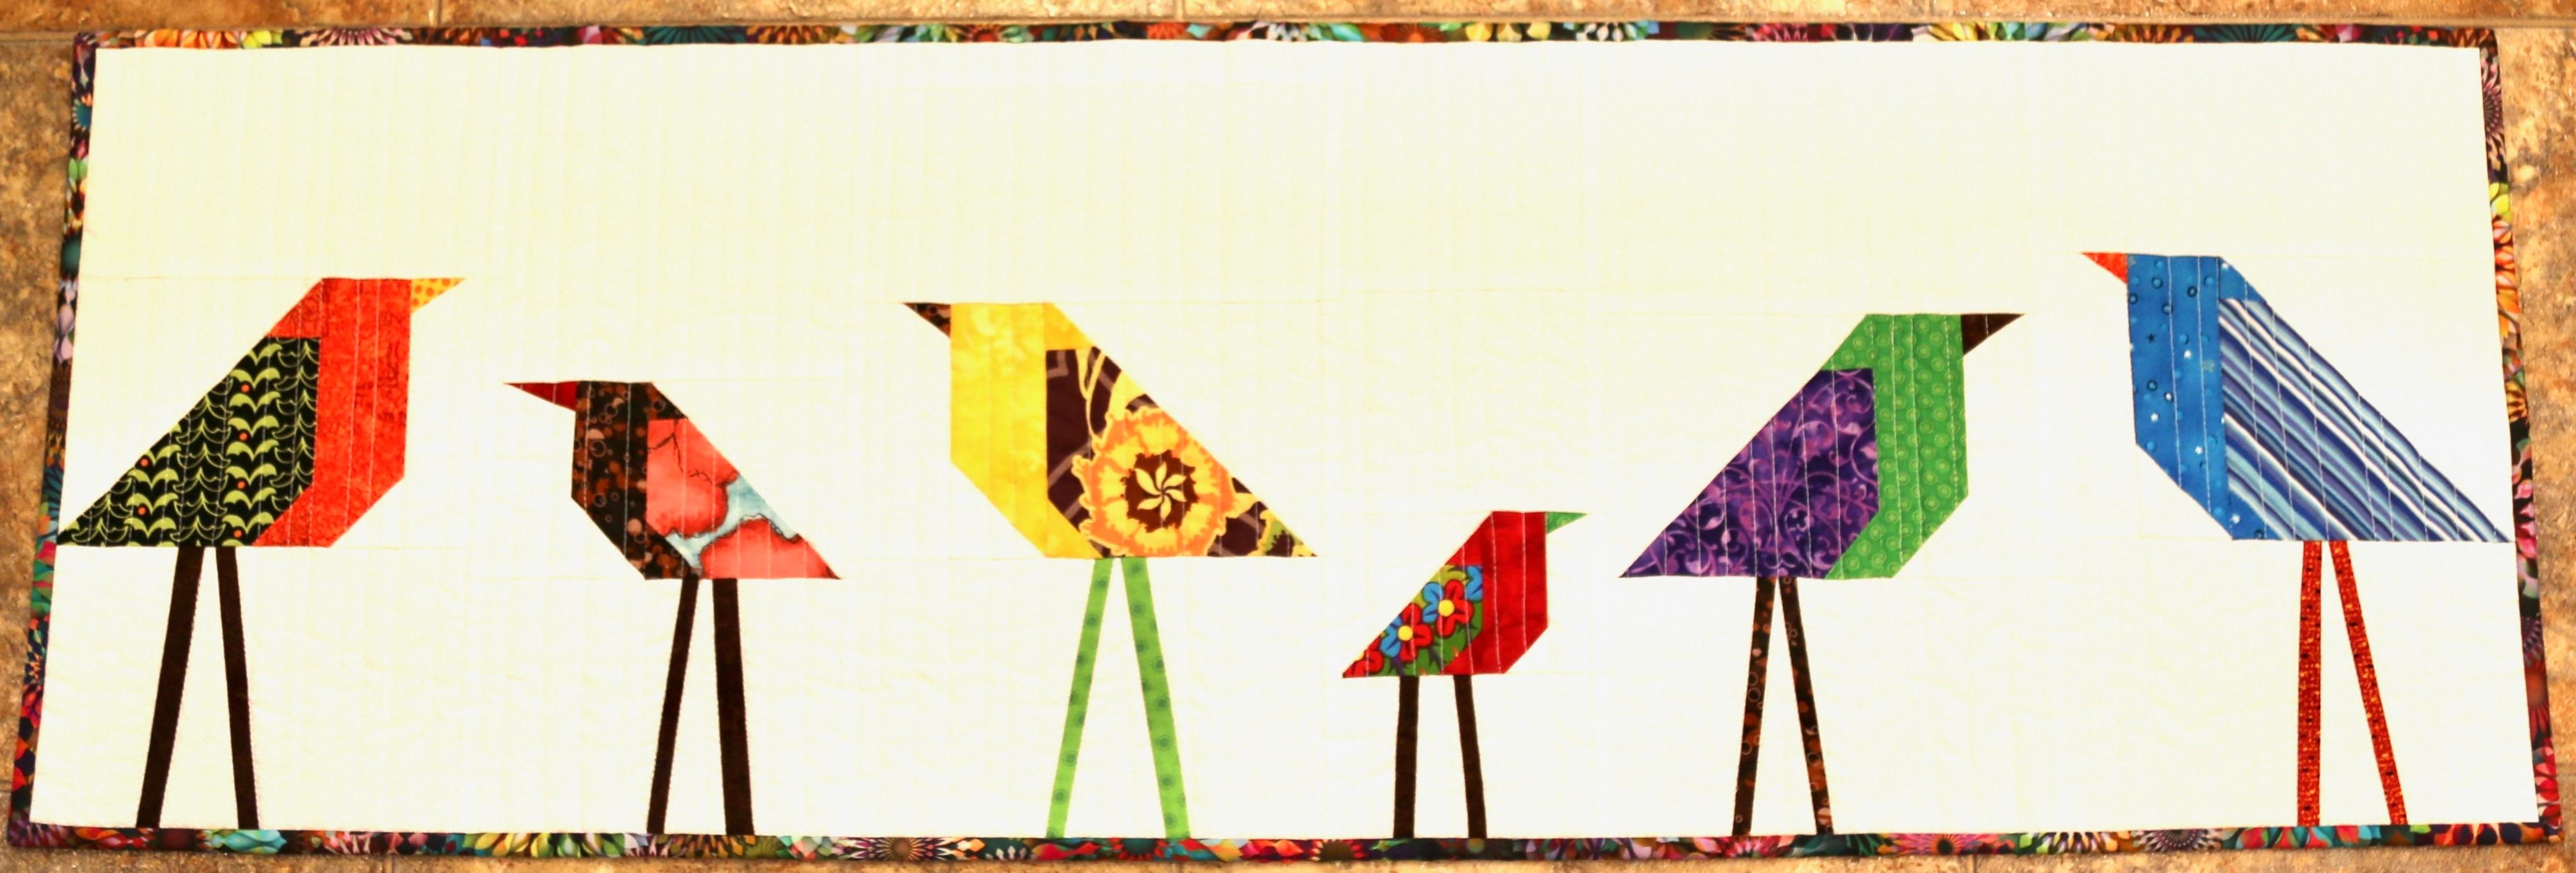 Cheryl Gould - For the Birds